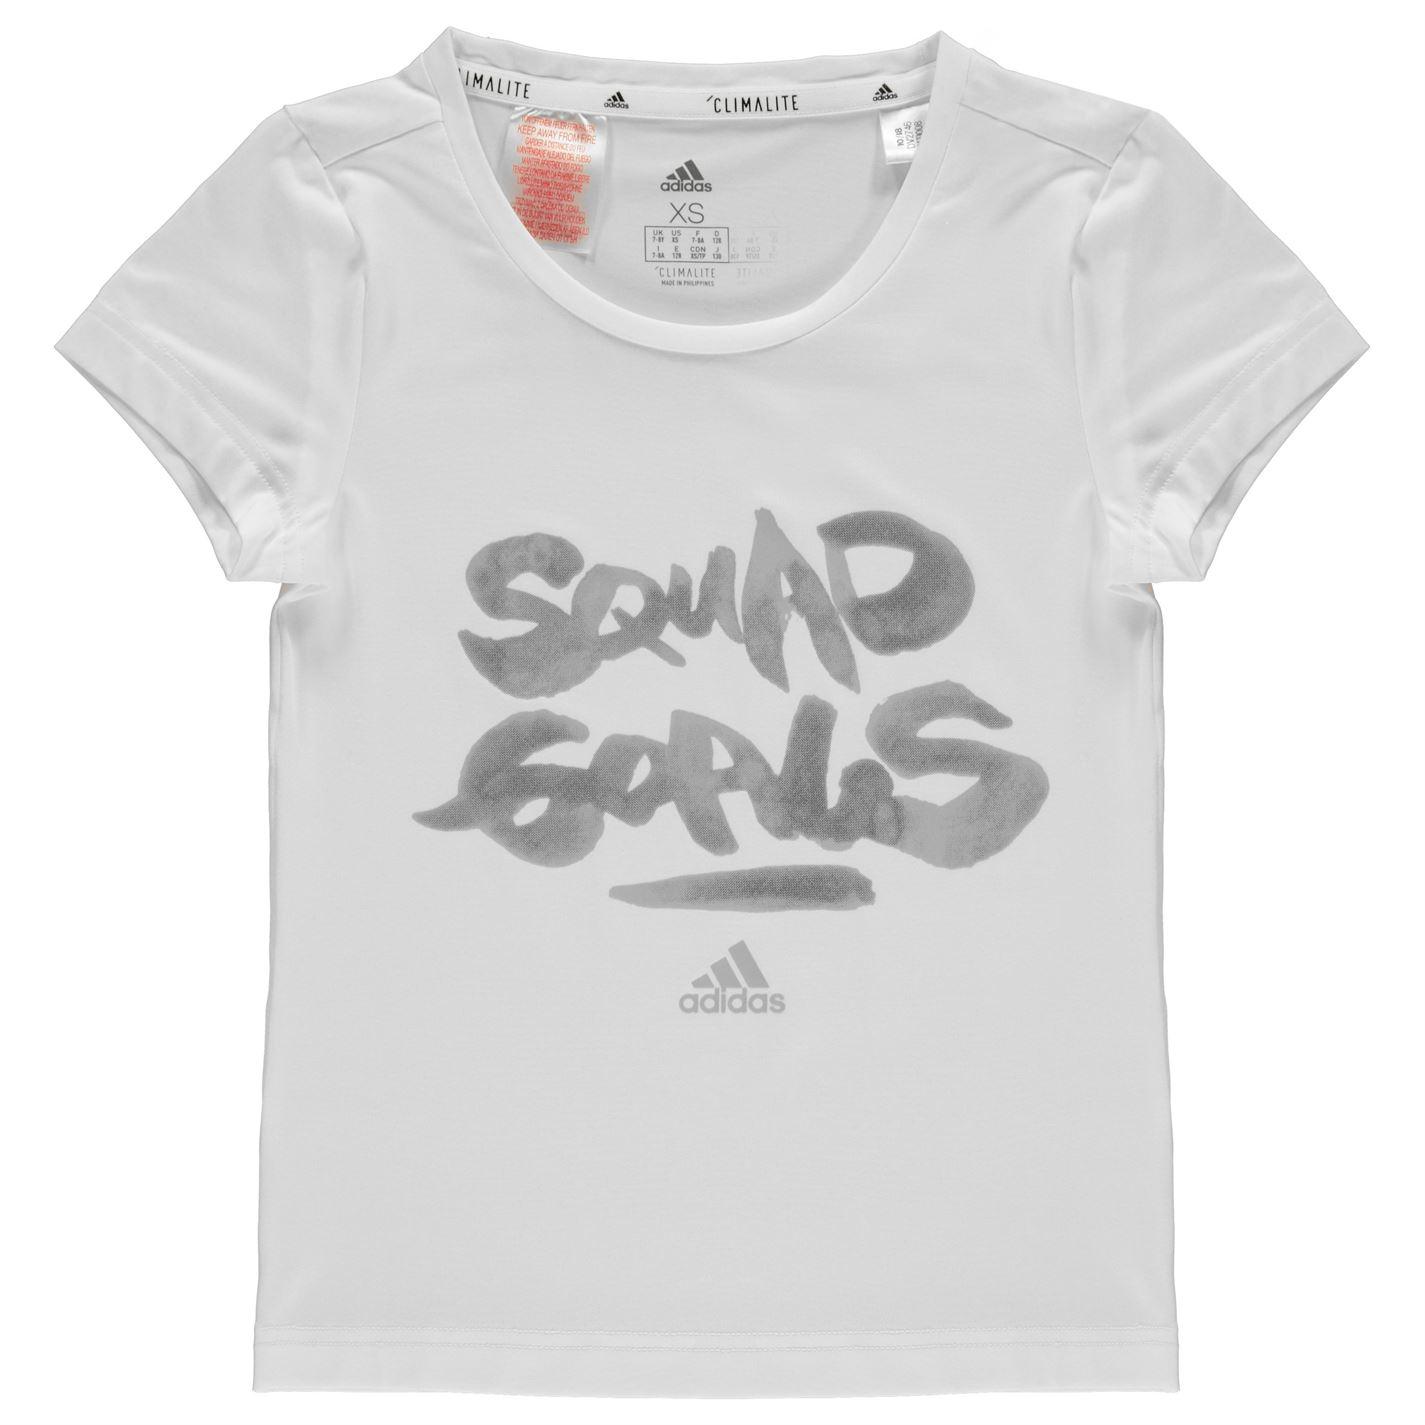 Adidas Squad T Shirt Junior Girls